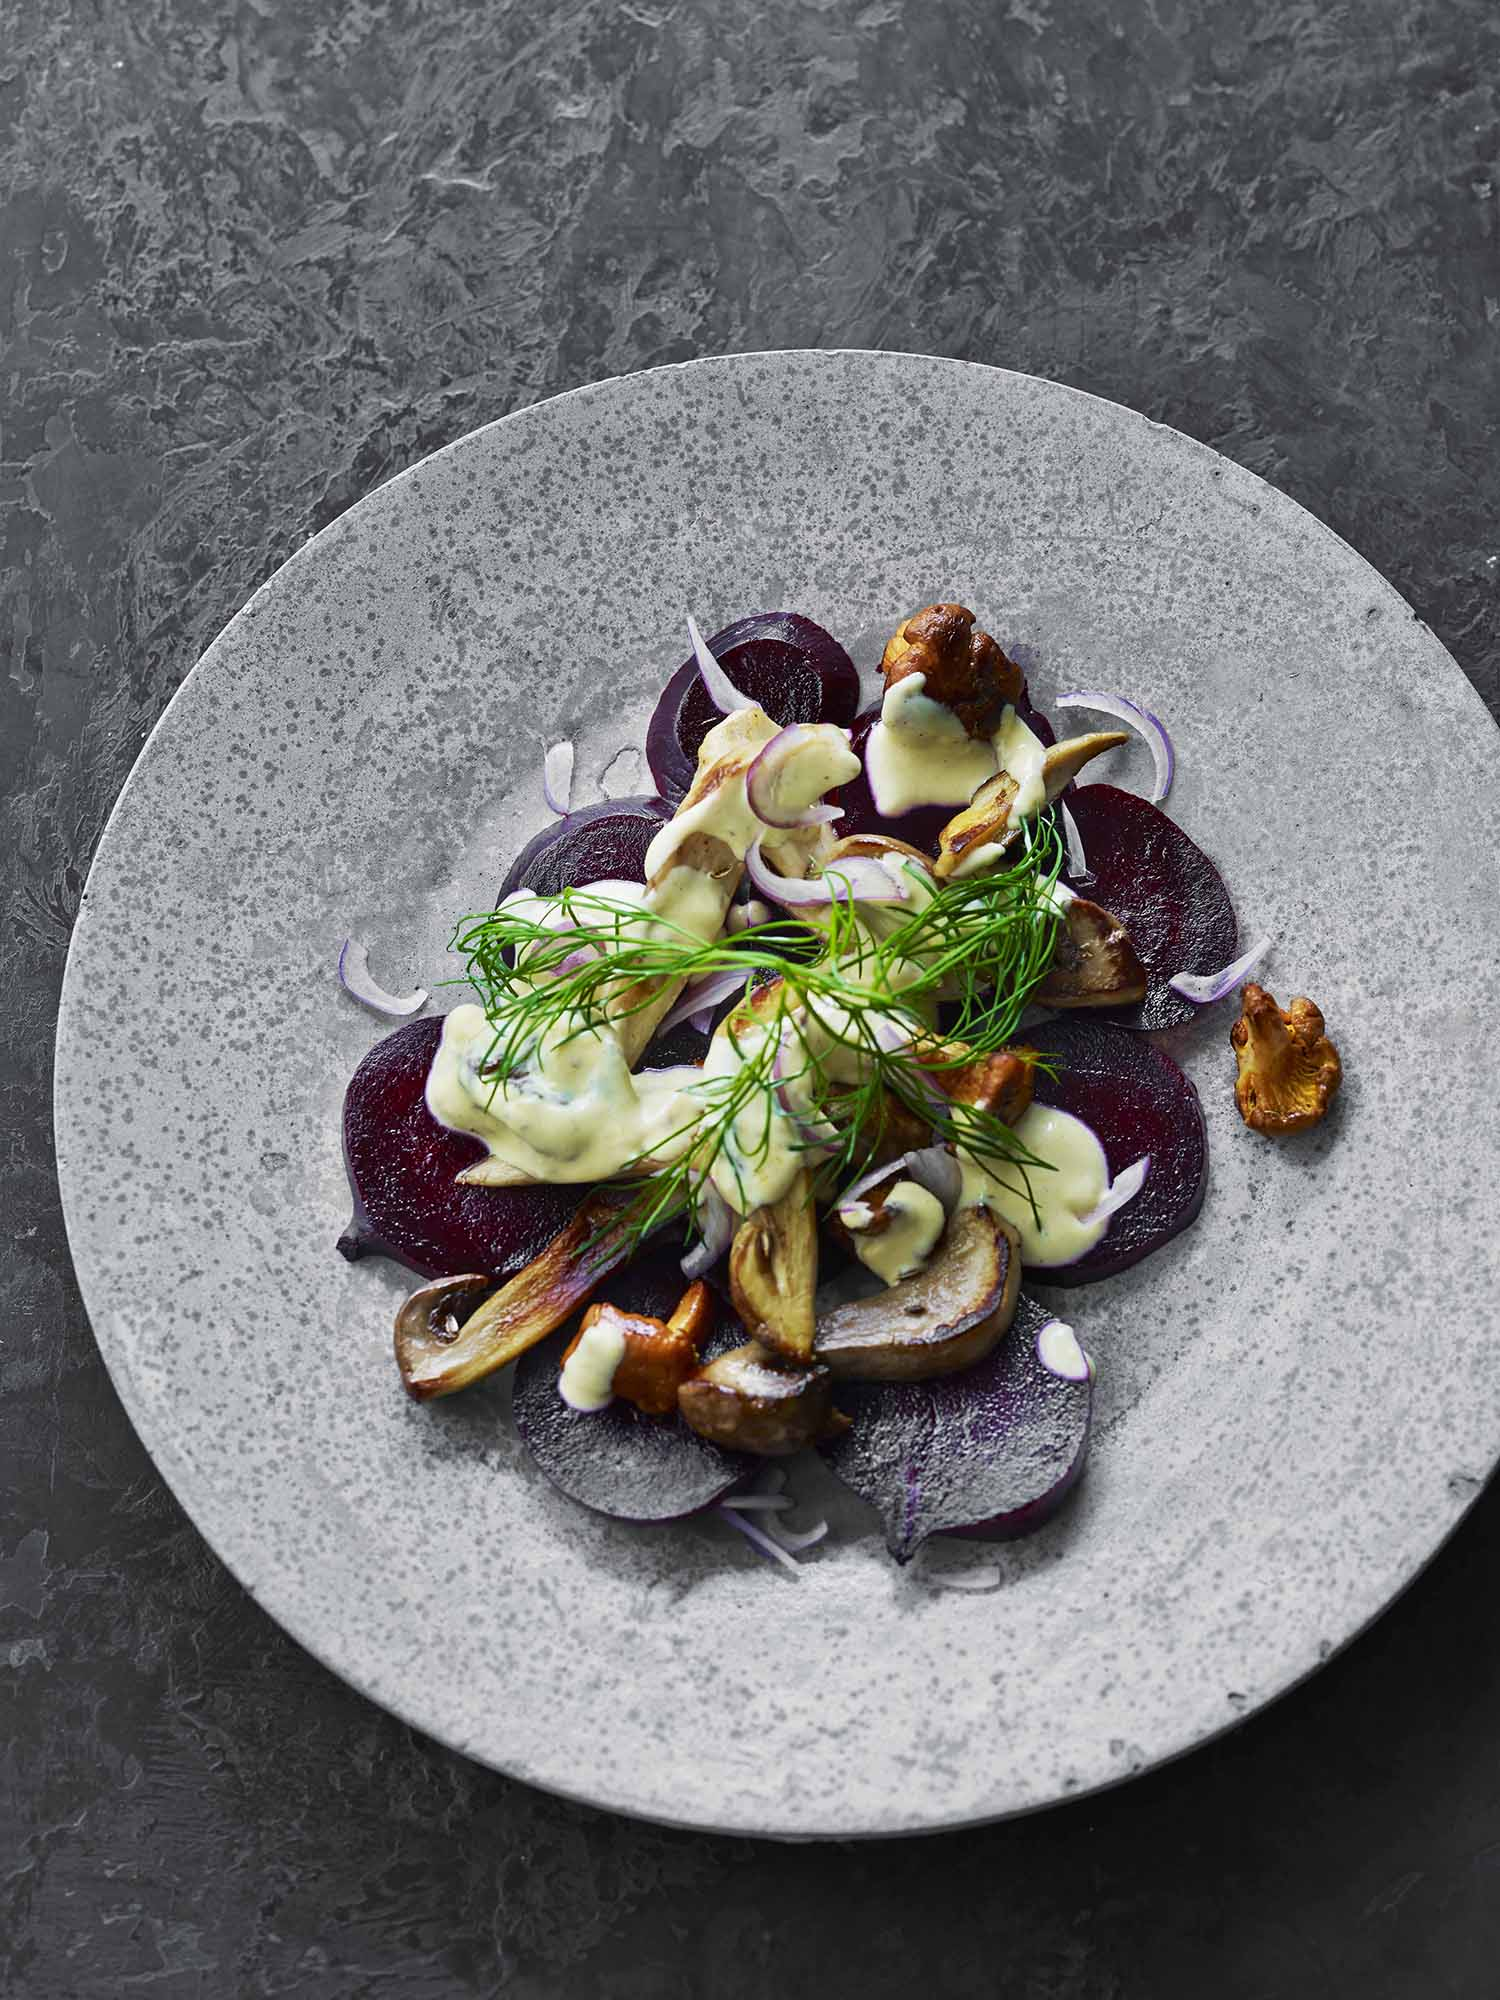 Lars Ranek - Beetroot salad